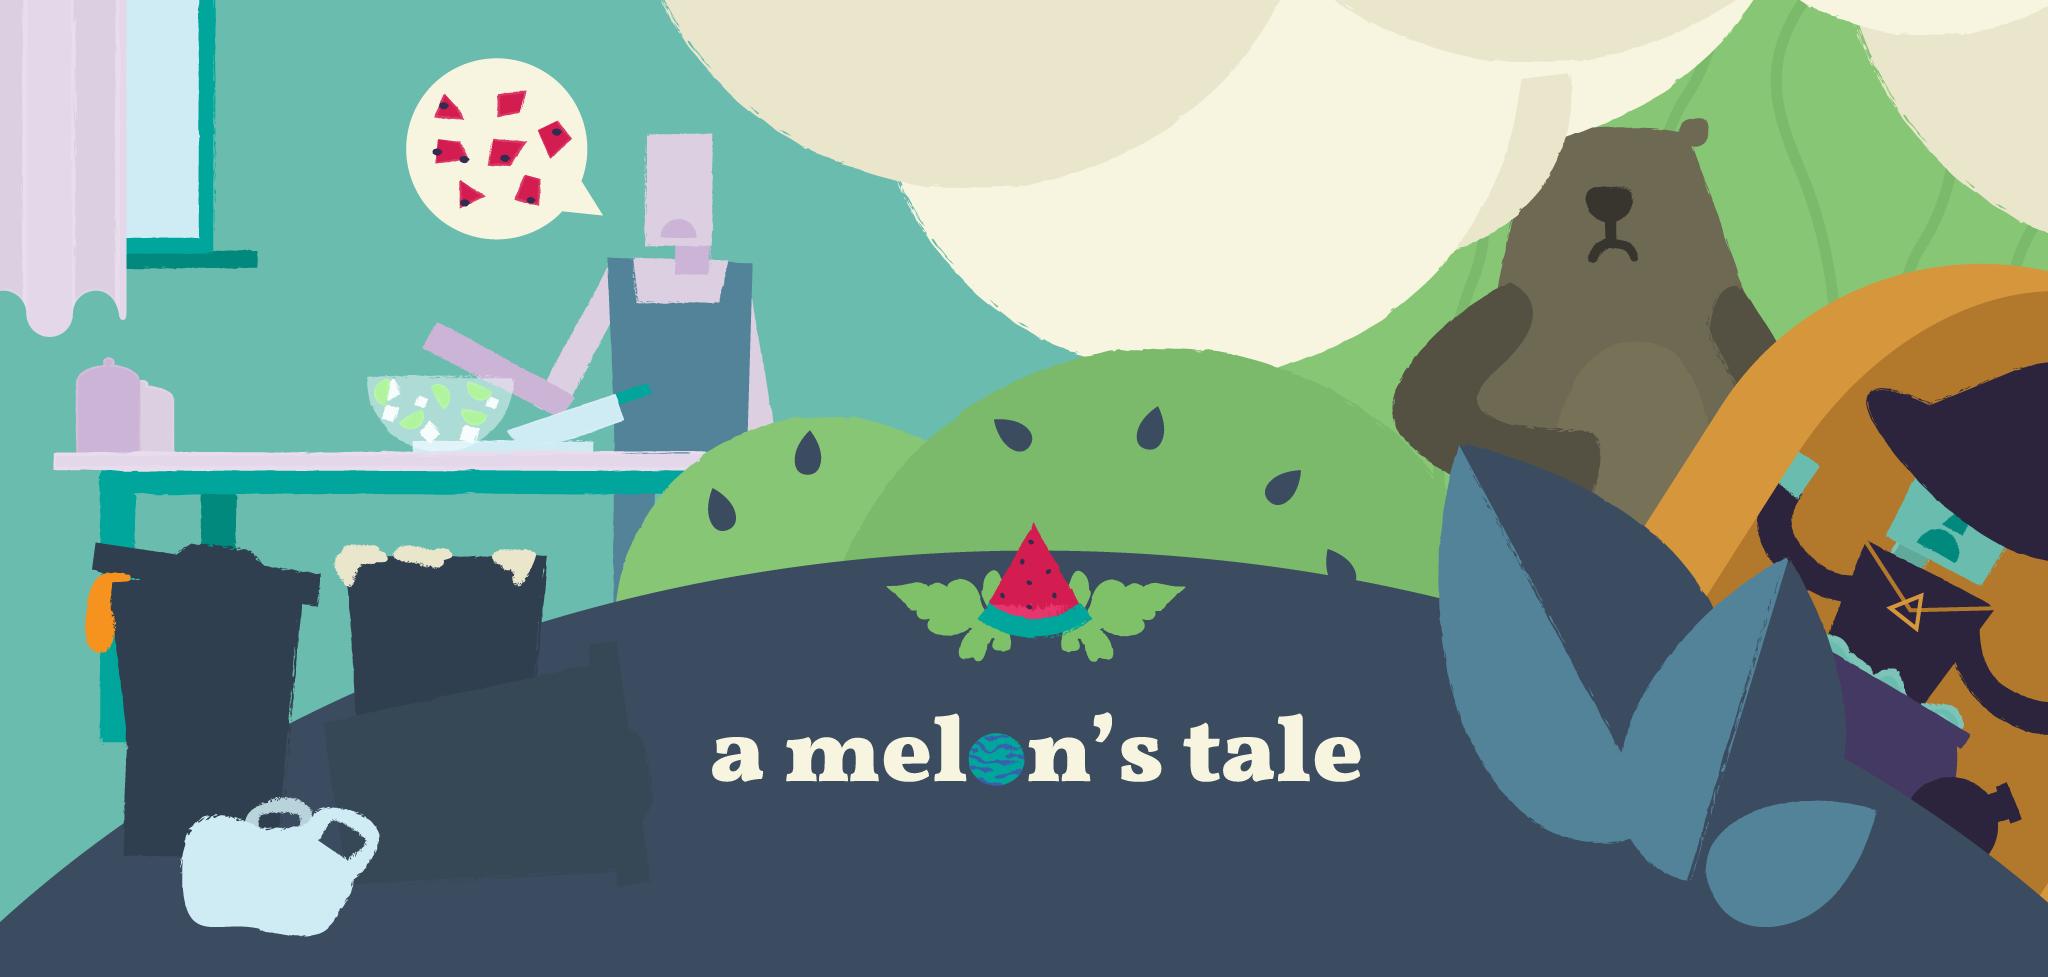 a melon's tale